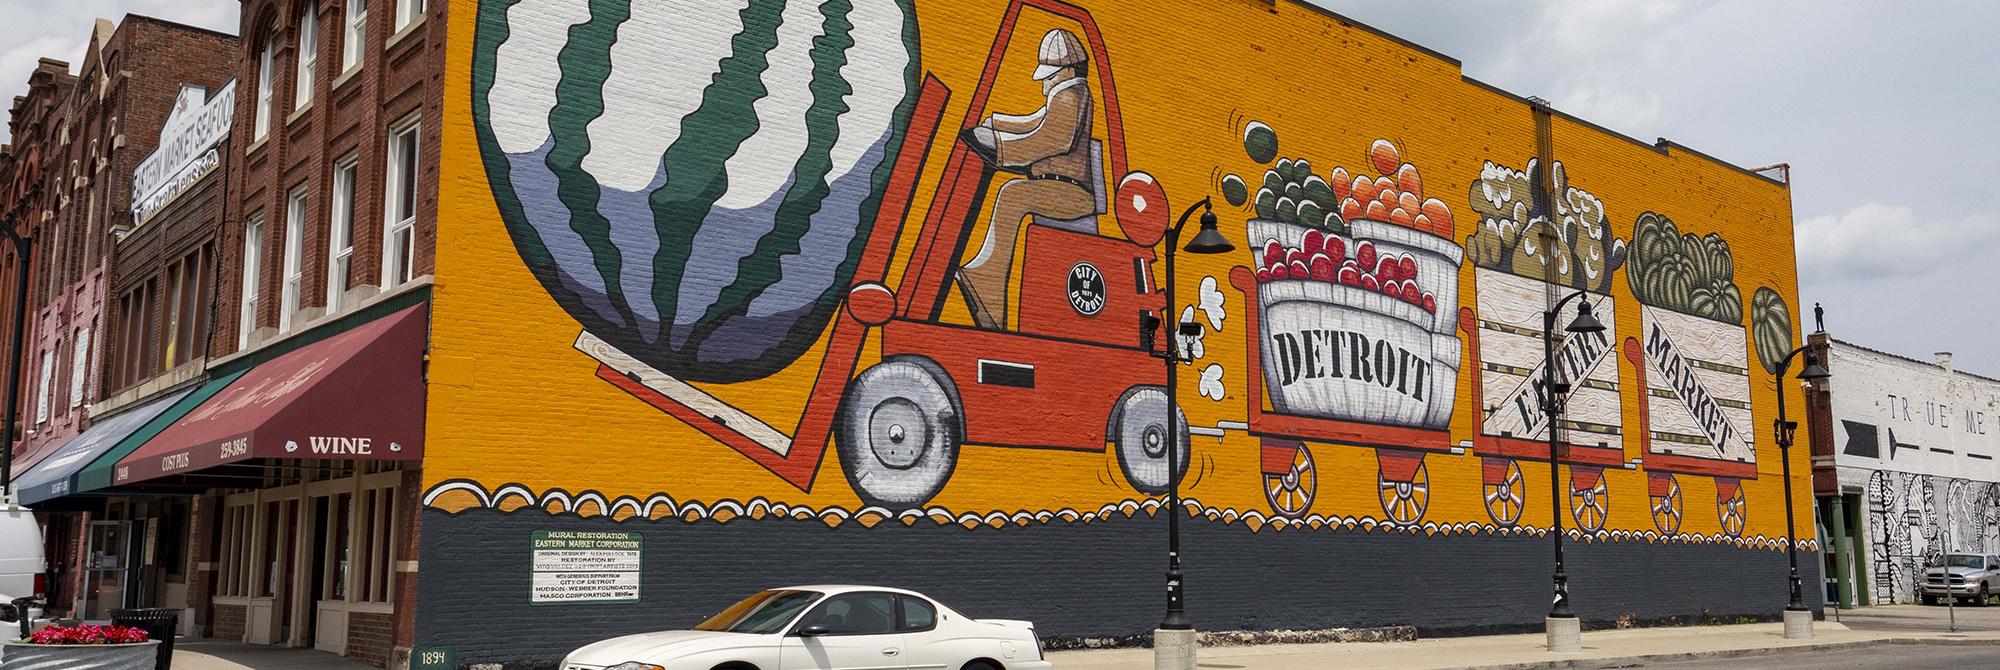 Eastern Market Mural. Photo by Bill Bowen. Courtesy of visitdetroit.com